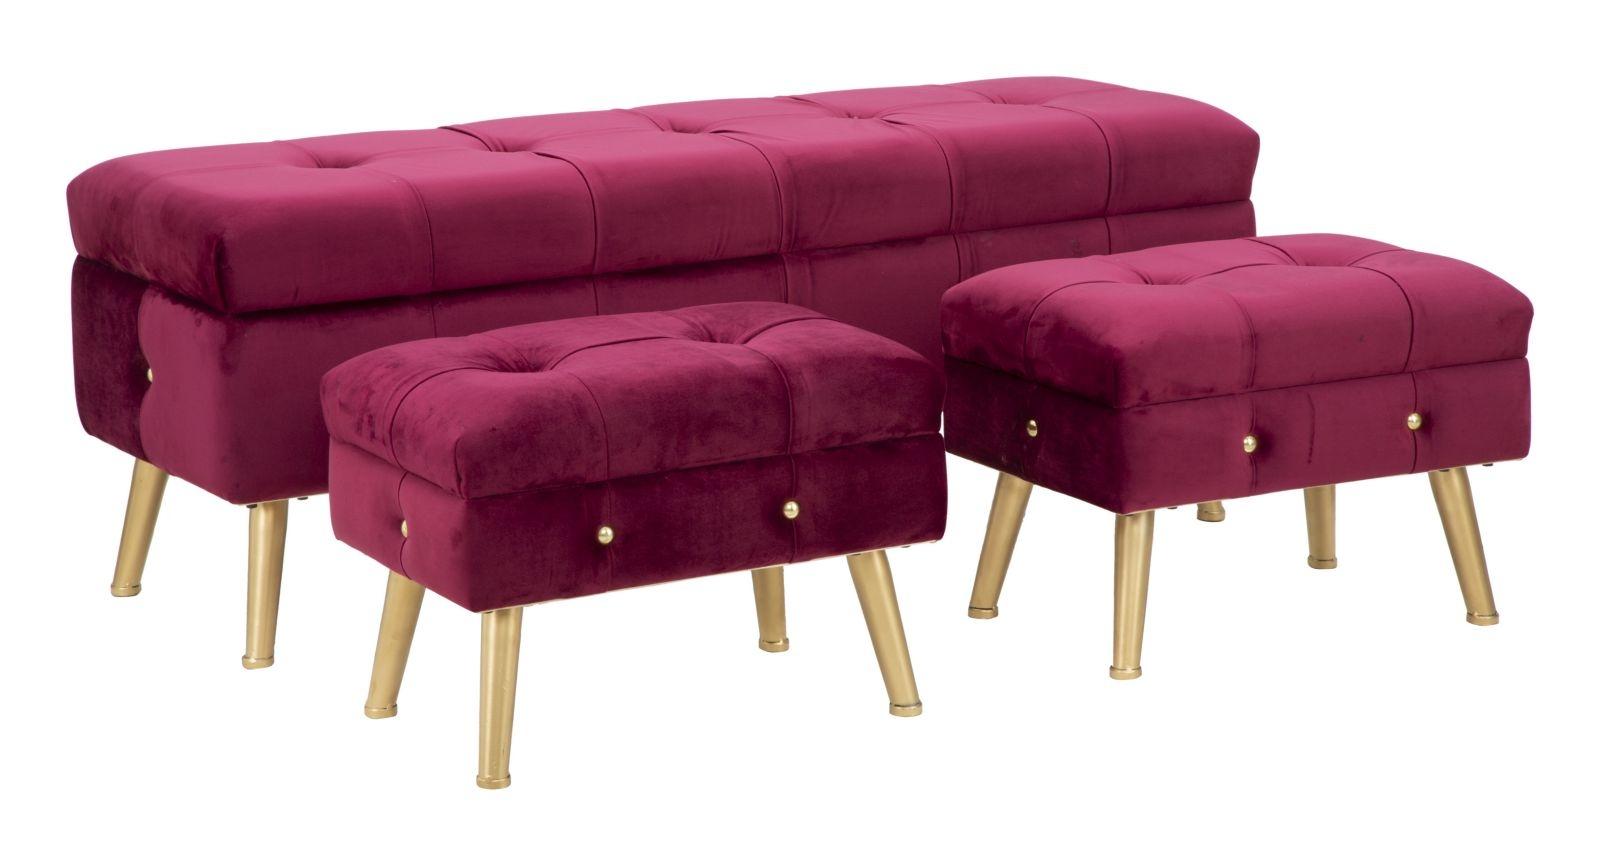 Set banca cu 2 taburete, tapitate cu stofa si picioare metalice Glam Bordeaux, l124xA42xH47,5 cm / l50xA34xH37 cm din categoria Taburete si Banci